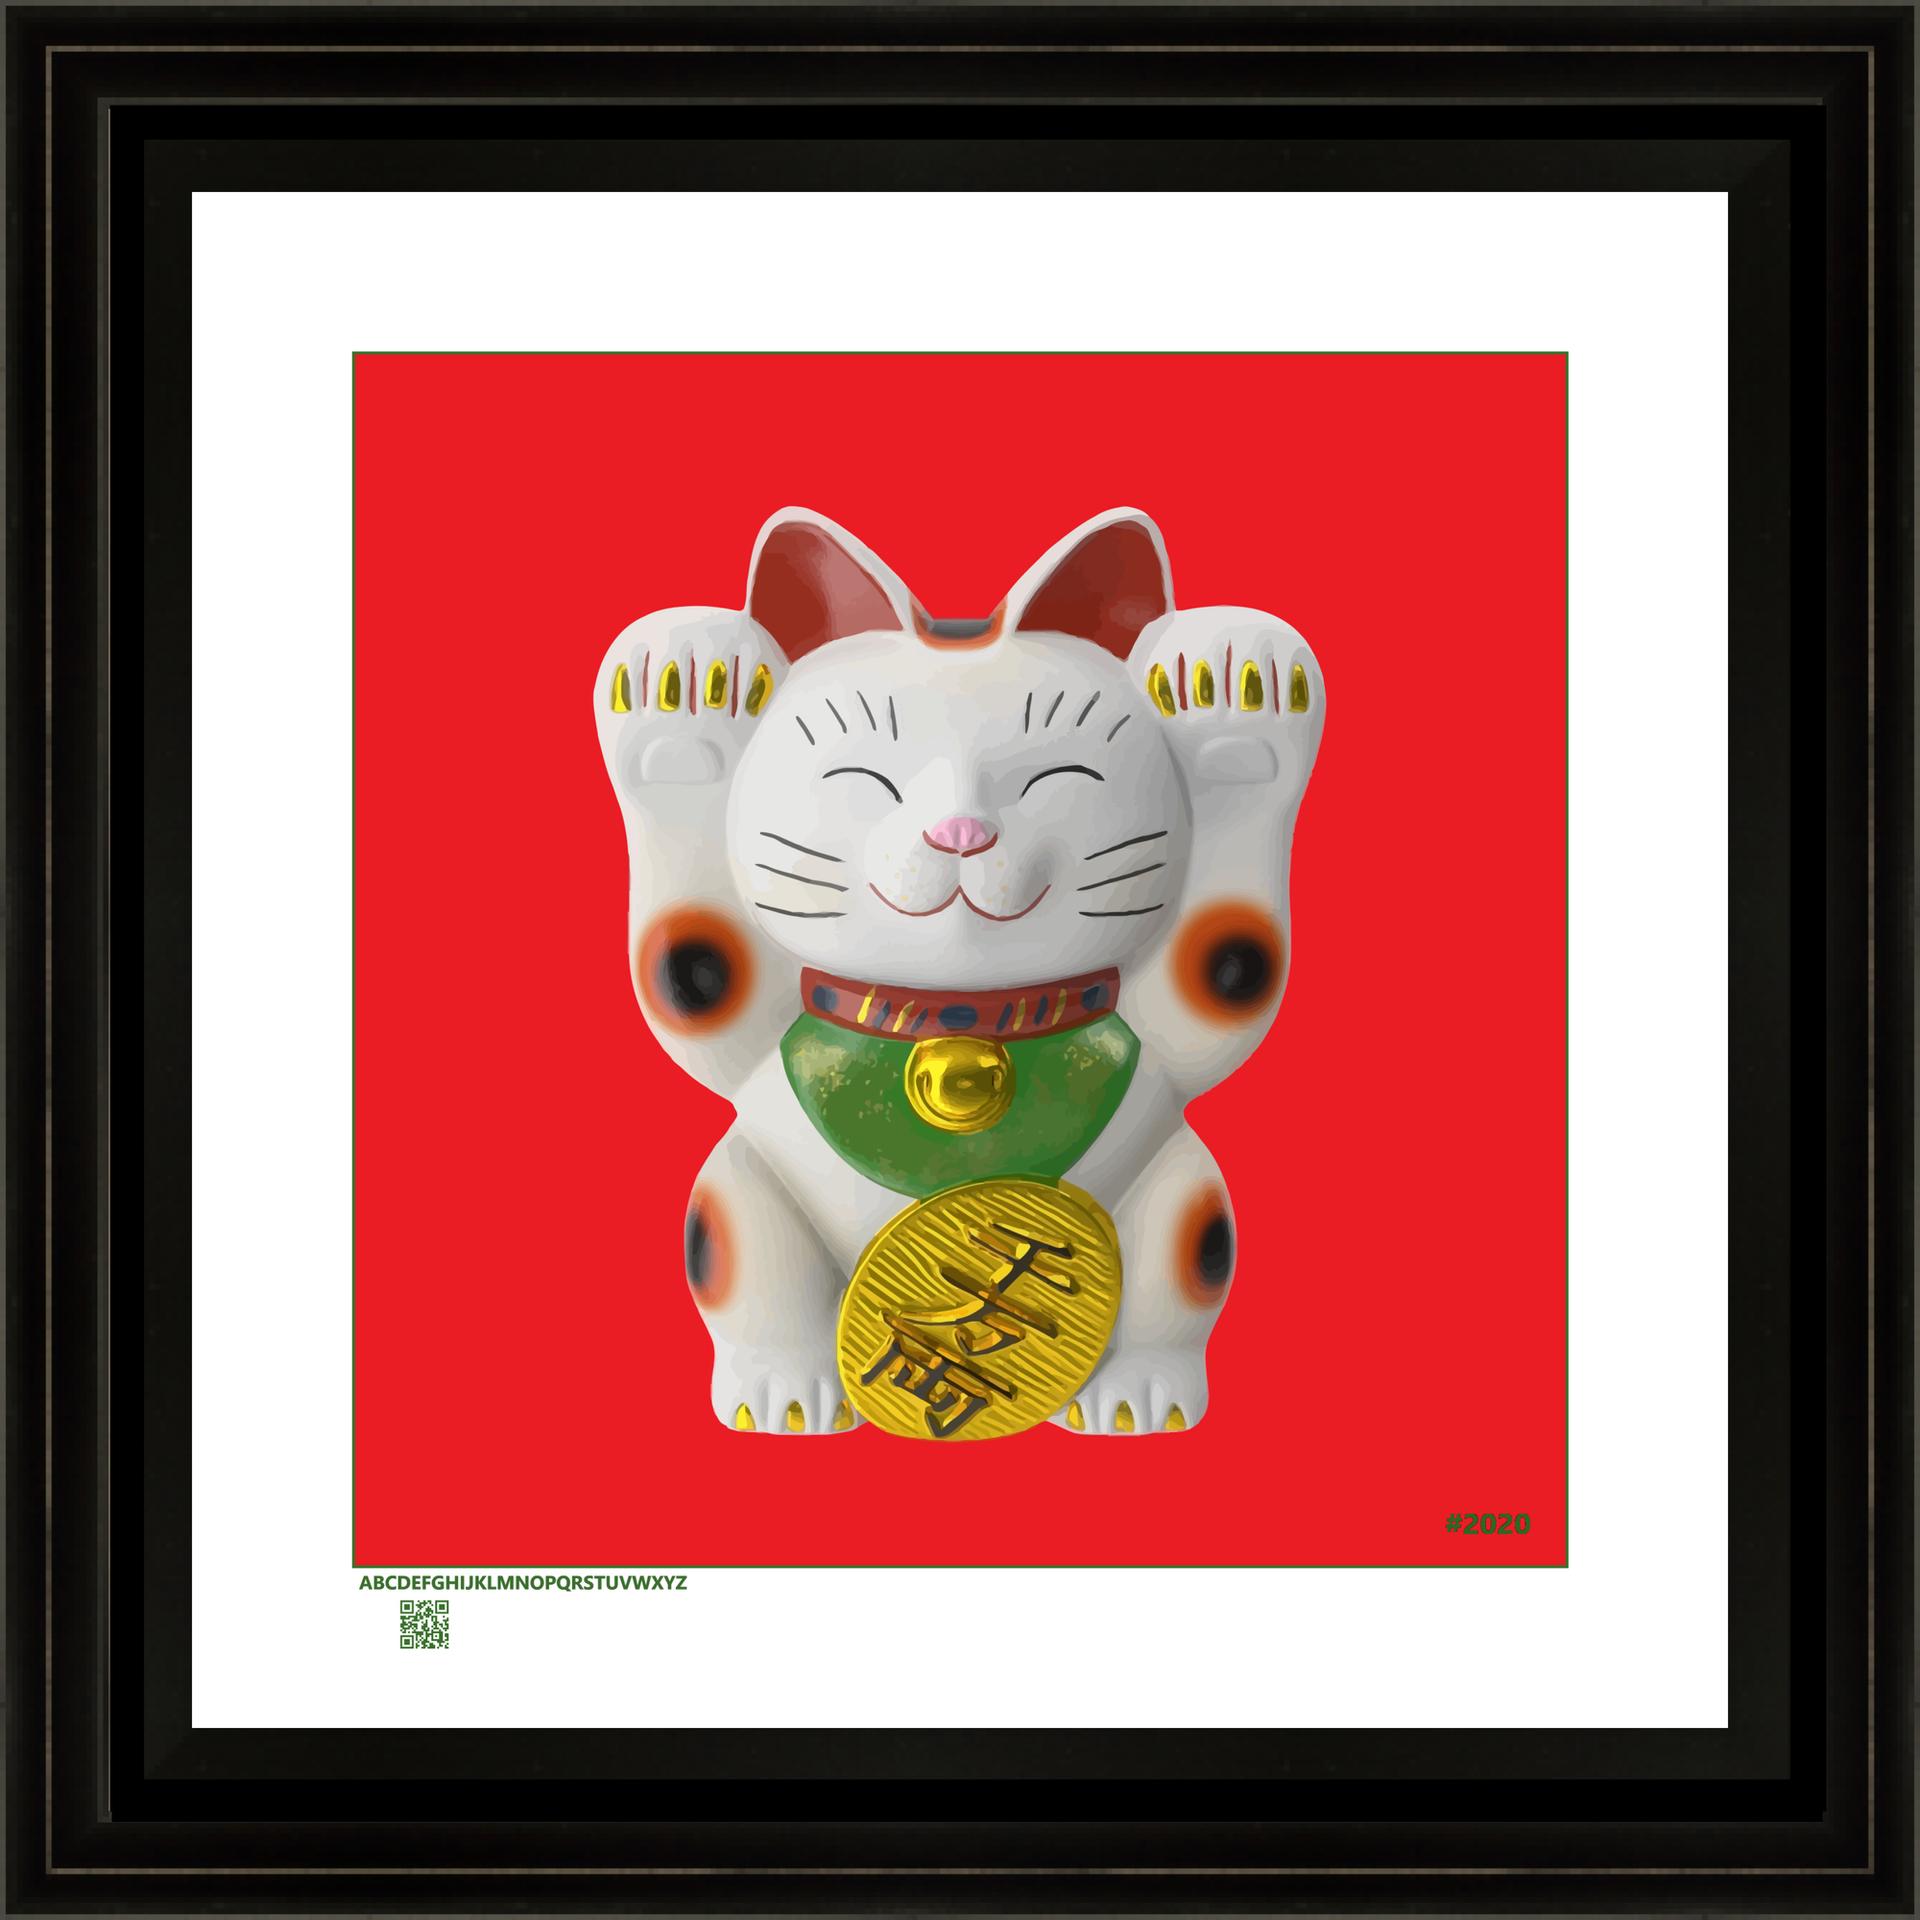 catManeki-Nekoredv109202012x12bfr.png